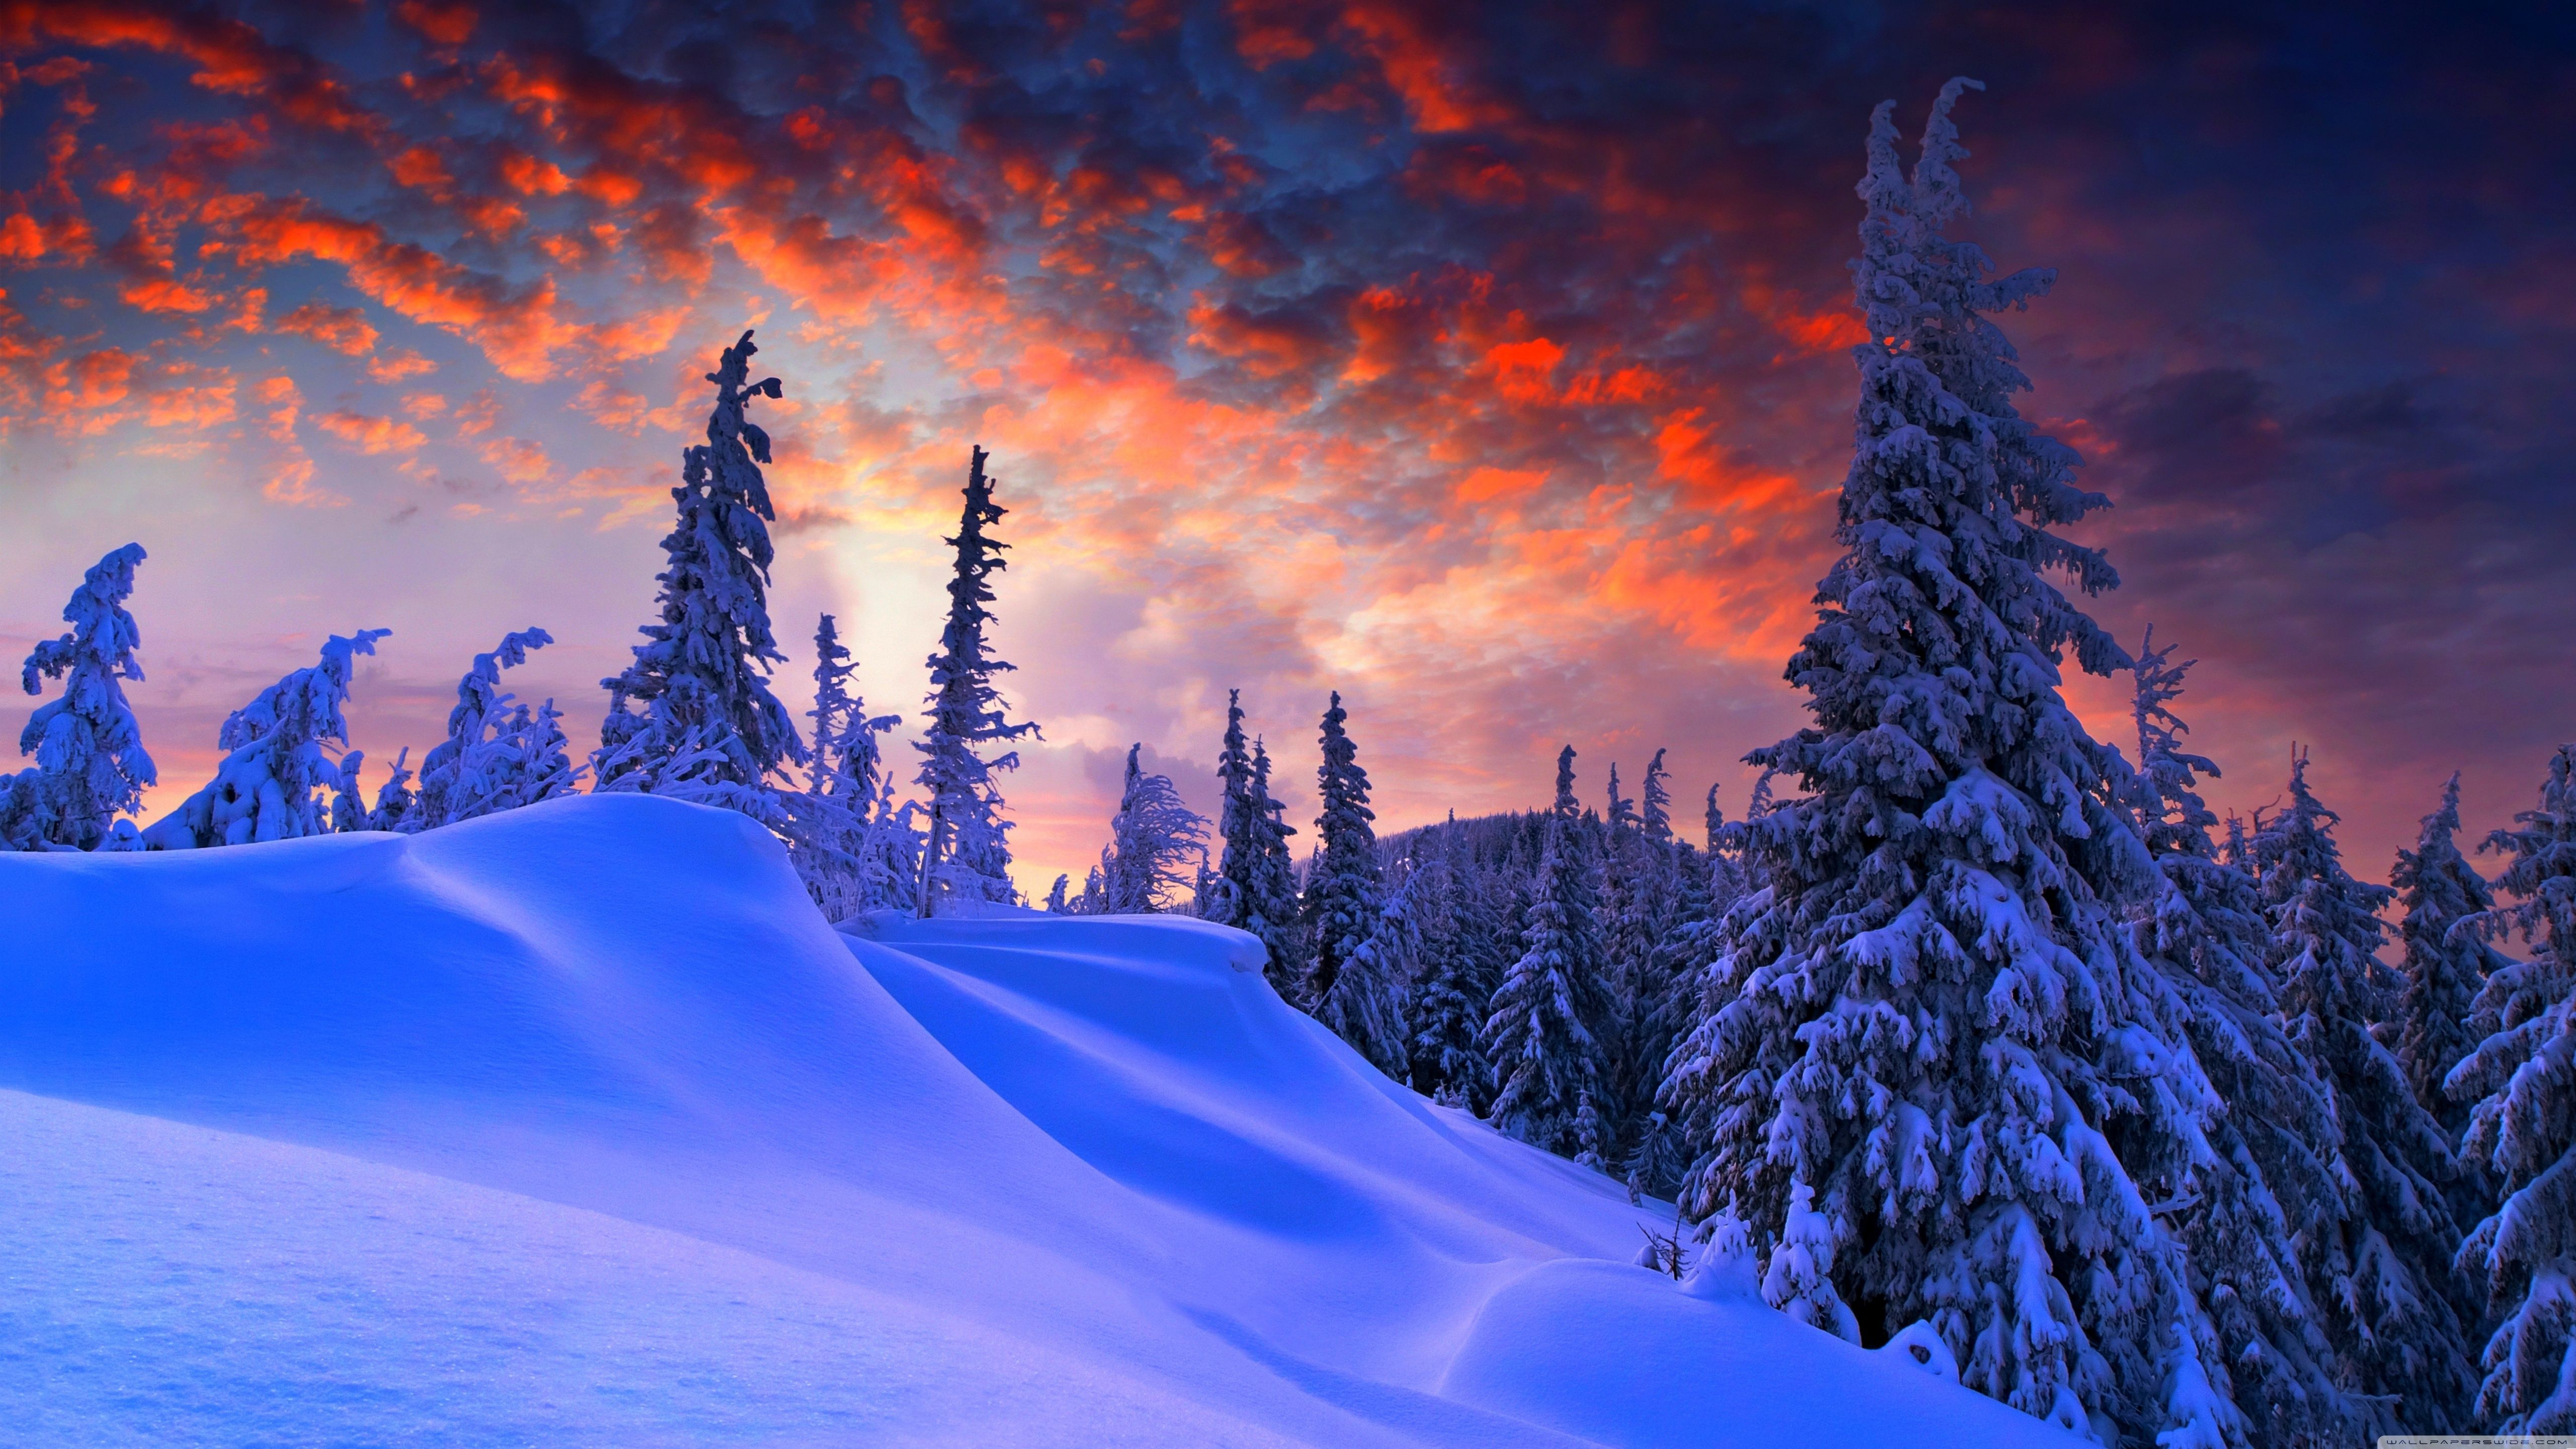 Winter Wallpapers - Top Free Winter